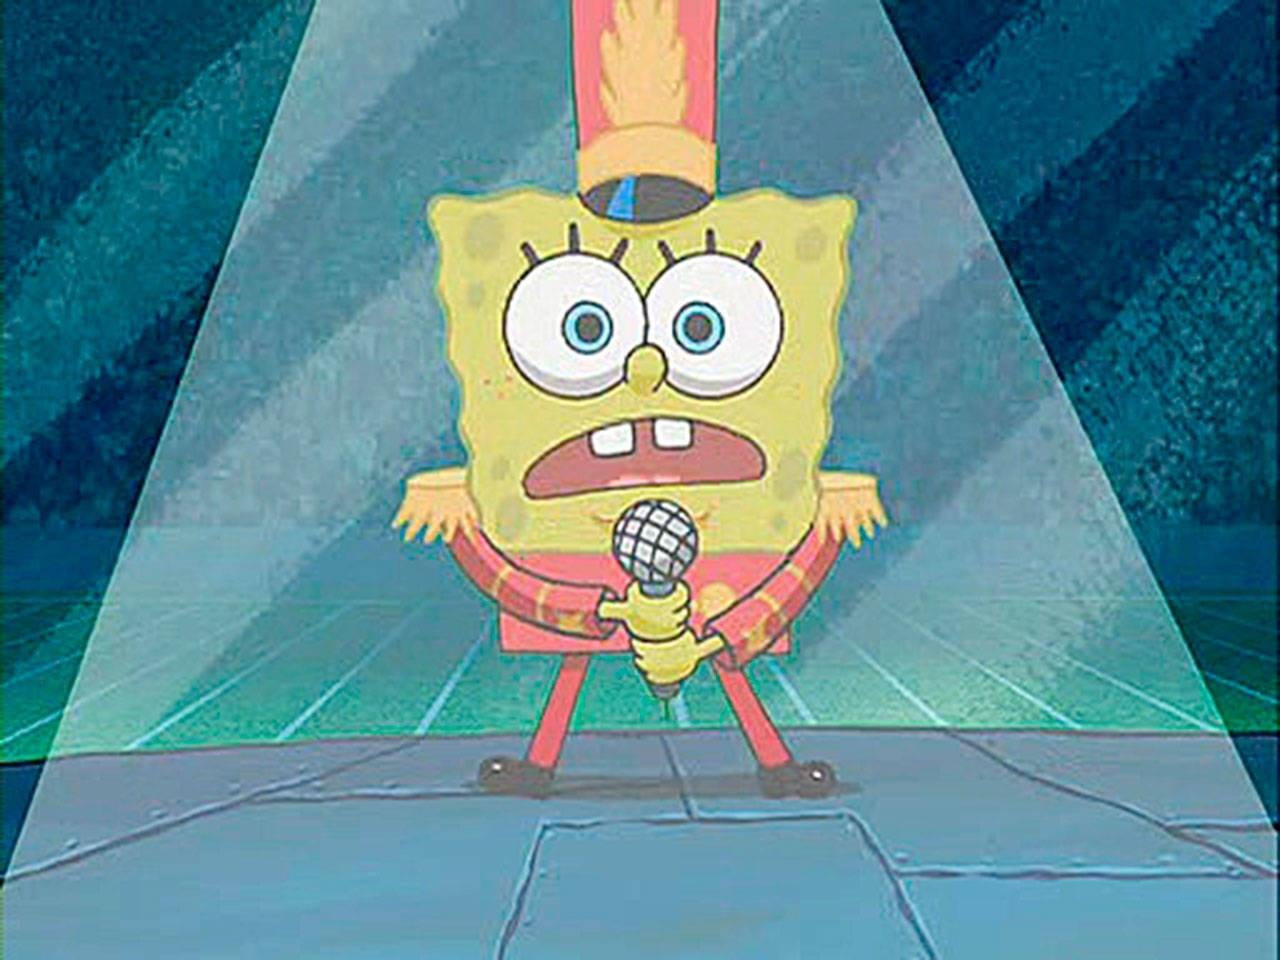 The Bigger Winner Of The Super Bowl? Spongebob Squarepants for Spongebob Squarepants Sweet Victory